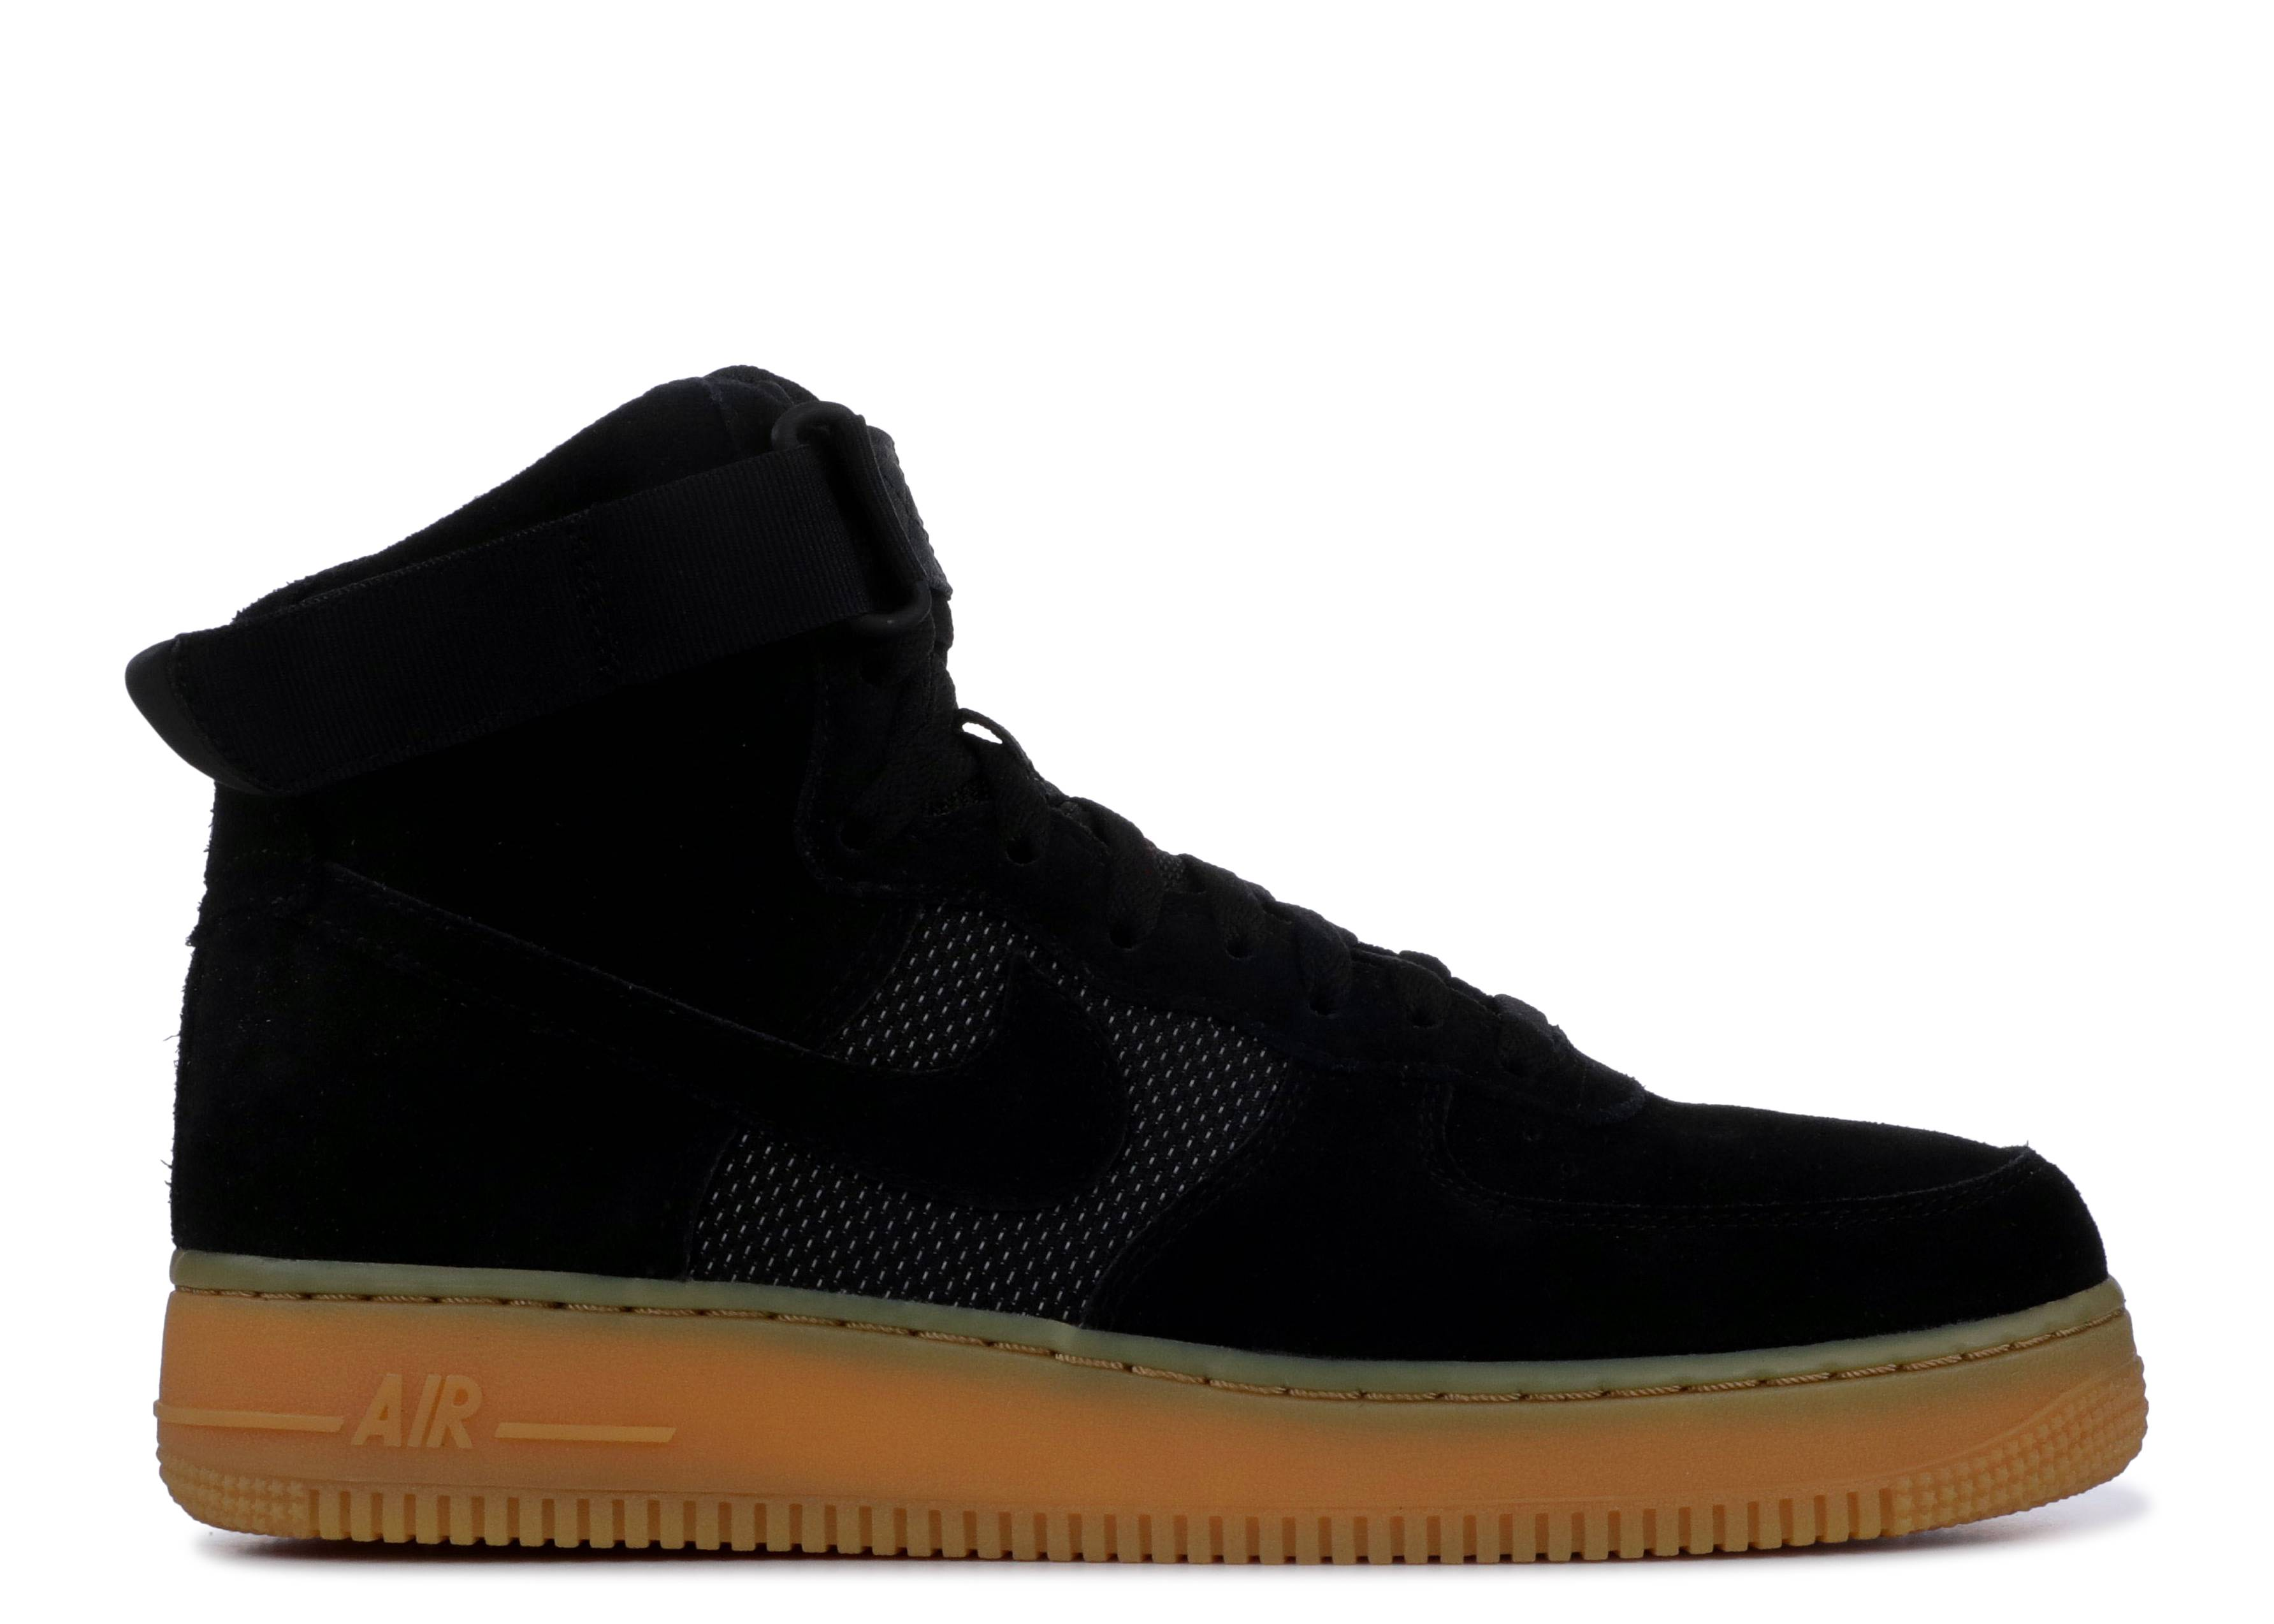 Air Force 1 High 07 Lv8 Black Gum Nike 806403 003 Black Black Gum Light Brown Flight Club